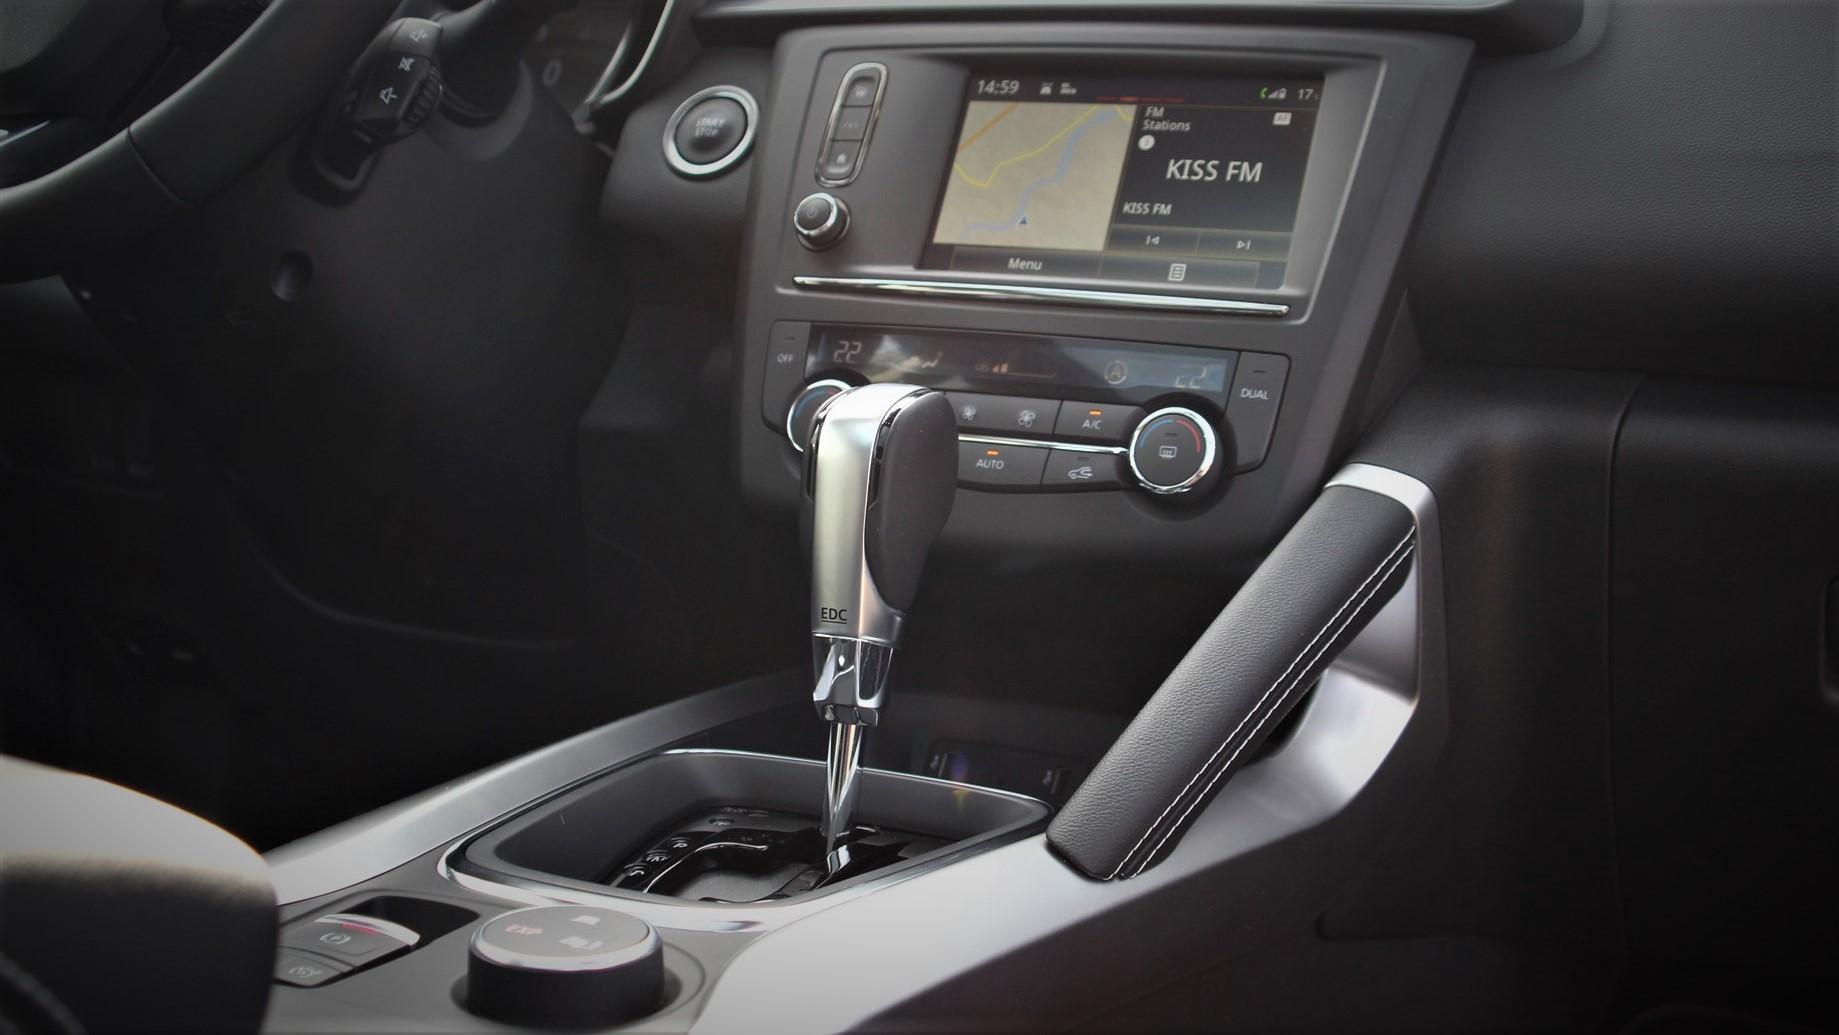 Renault kadjar 1 2 tce 130 cp edc review for Interior renault kadjar